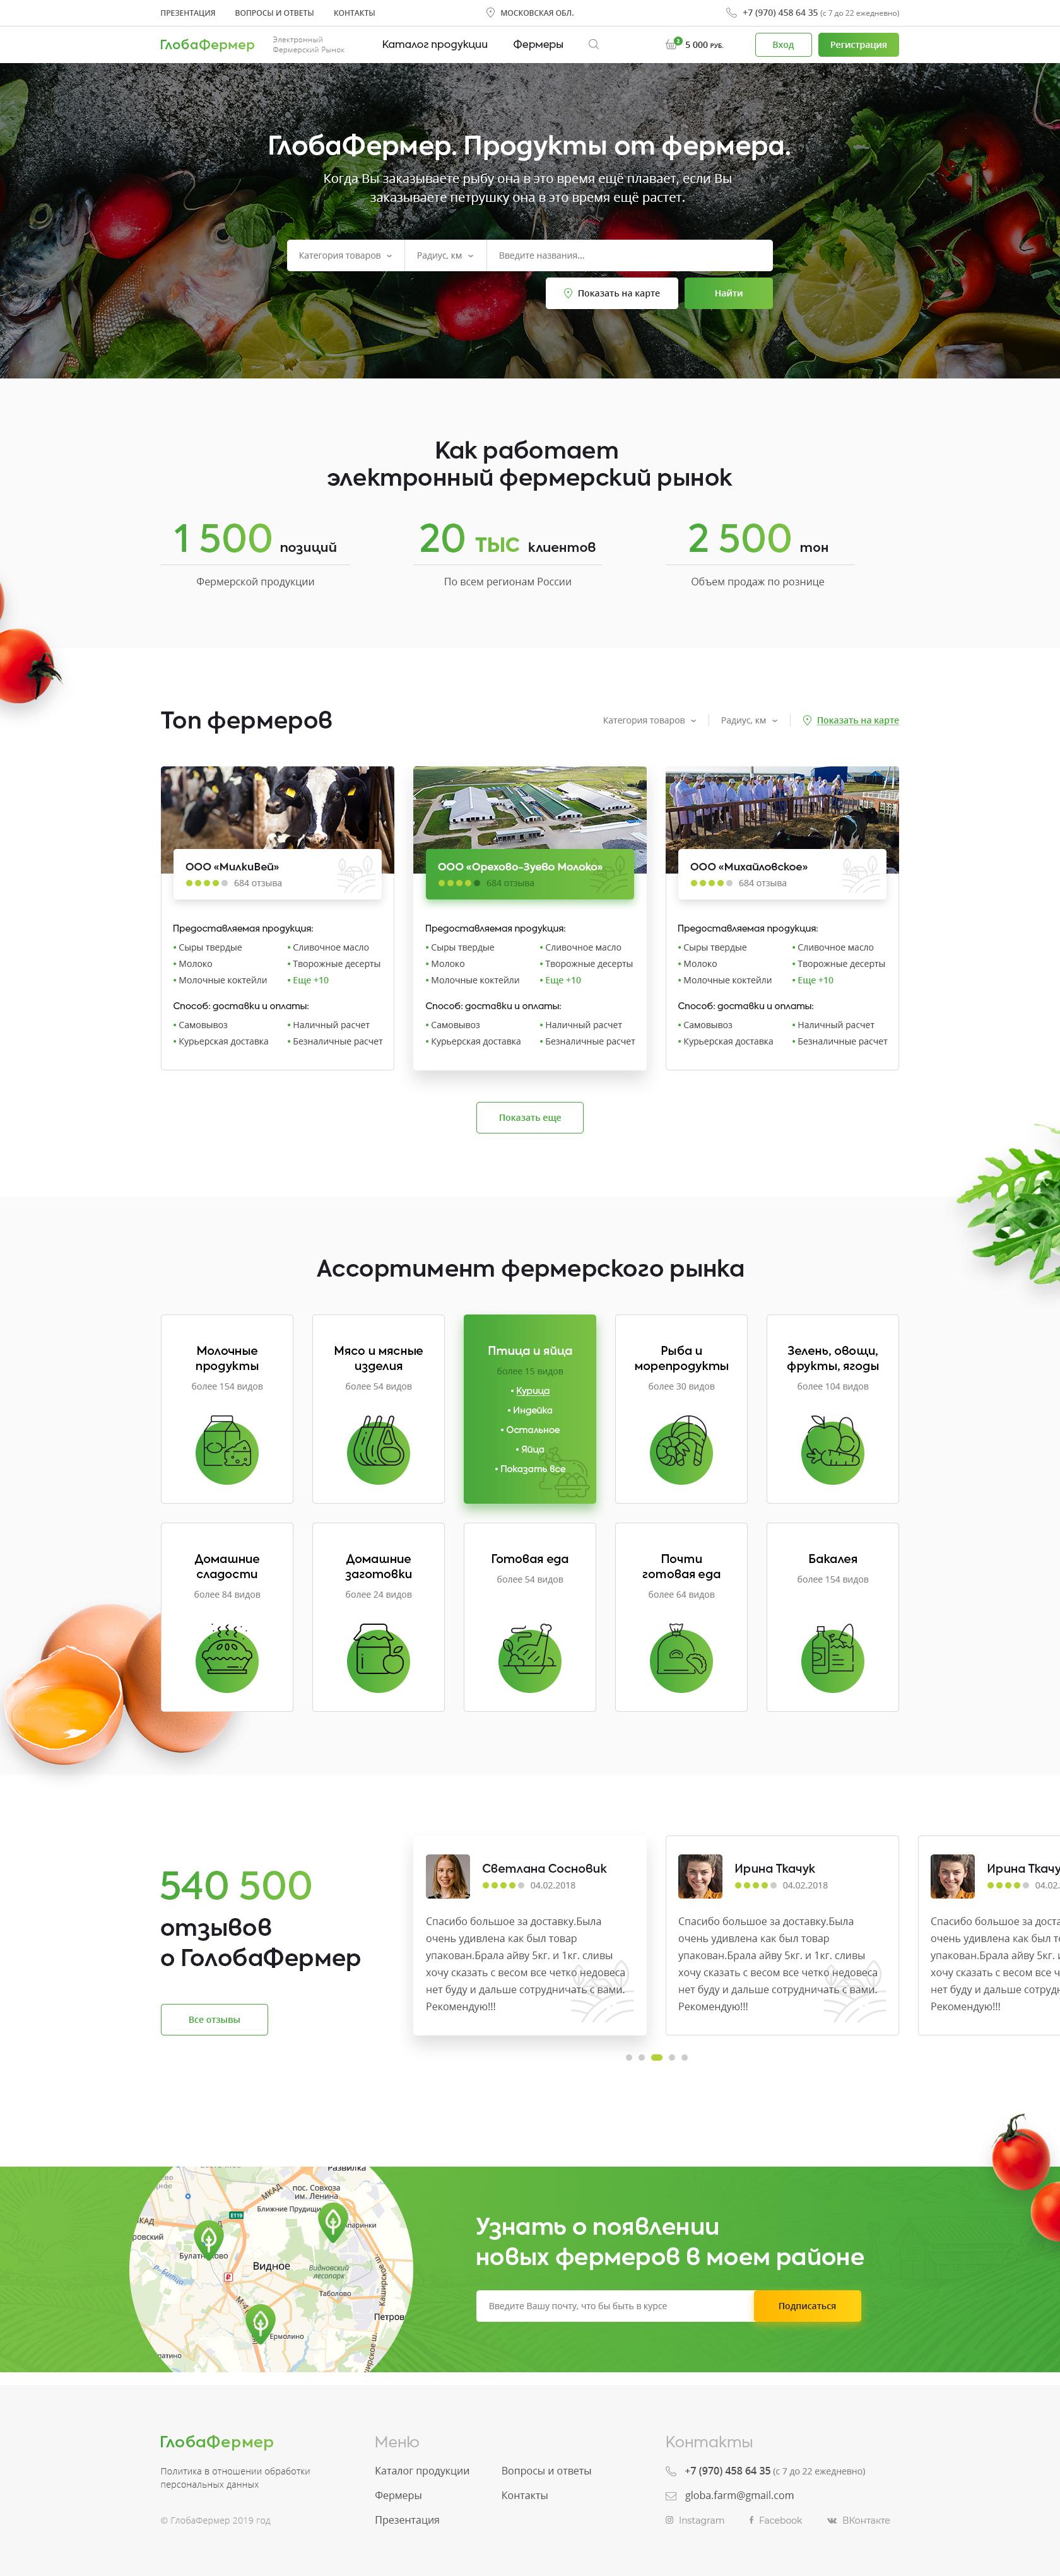 ГлобаФермер, электронный фермерский рынок